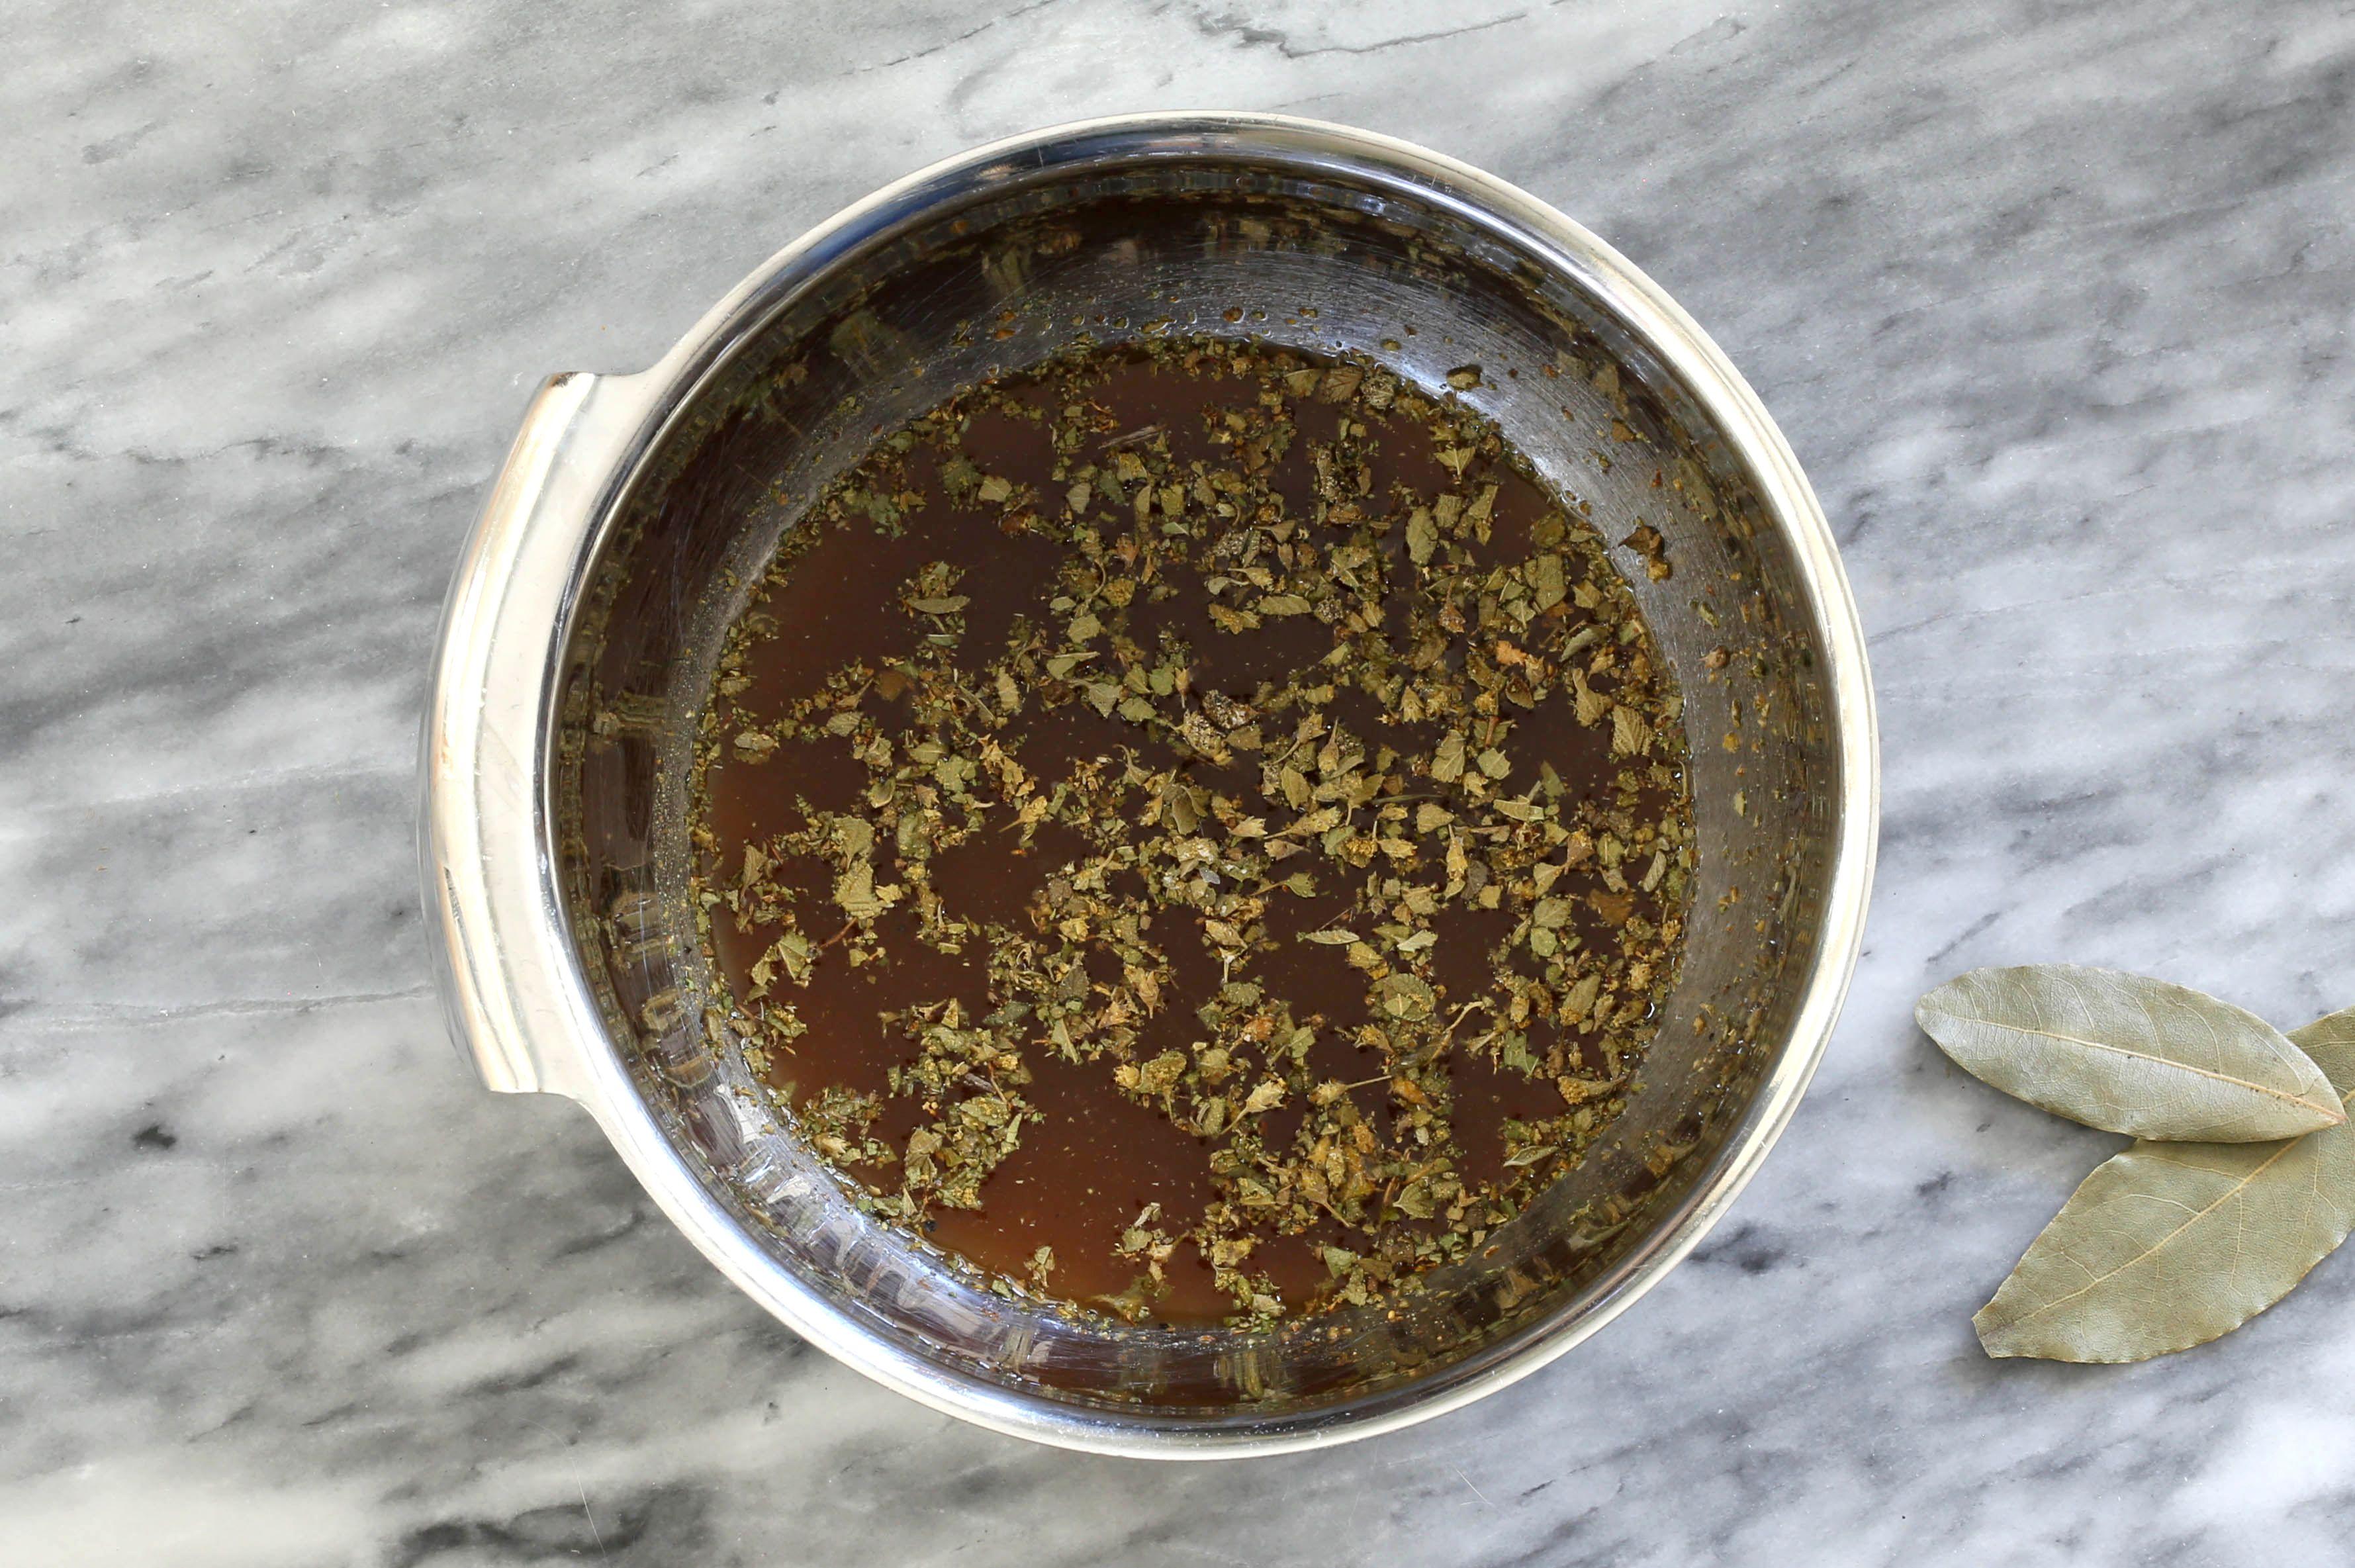 Combine the liquids and seasonings.